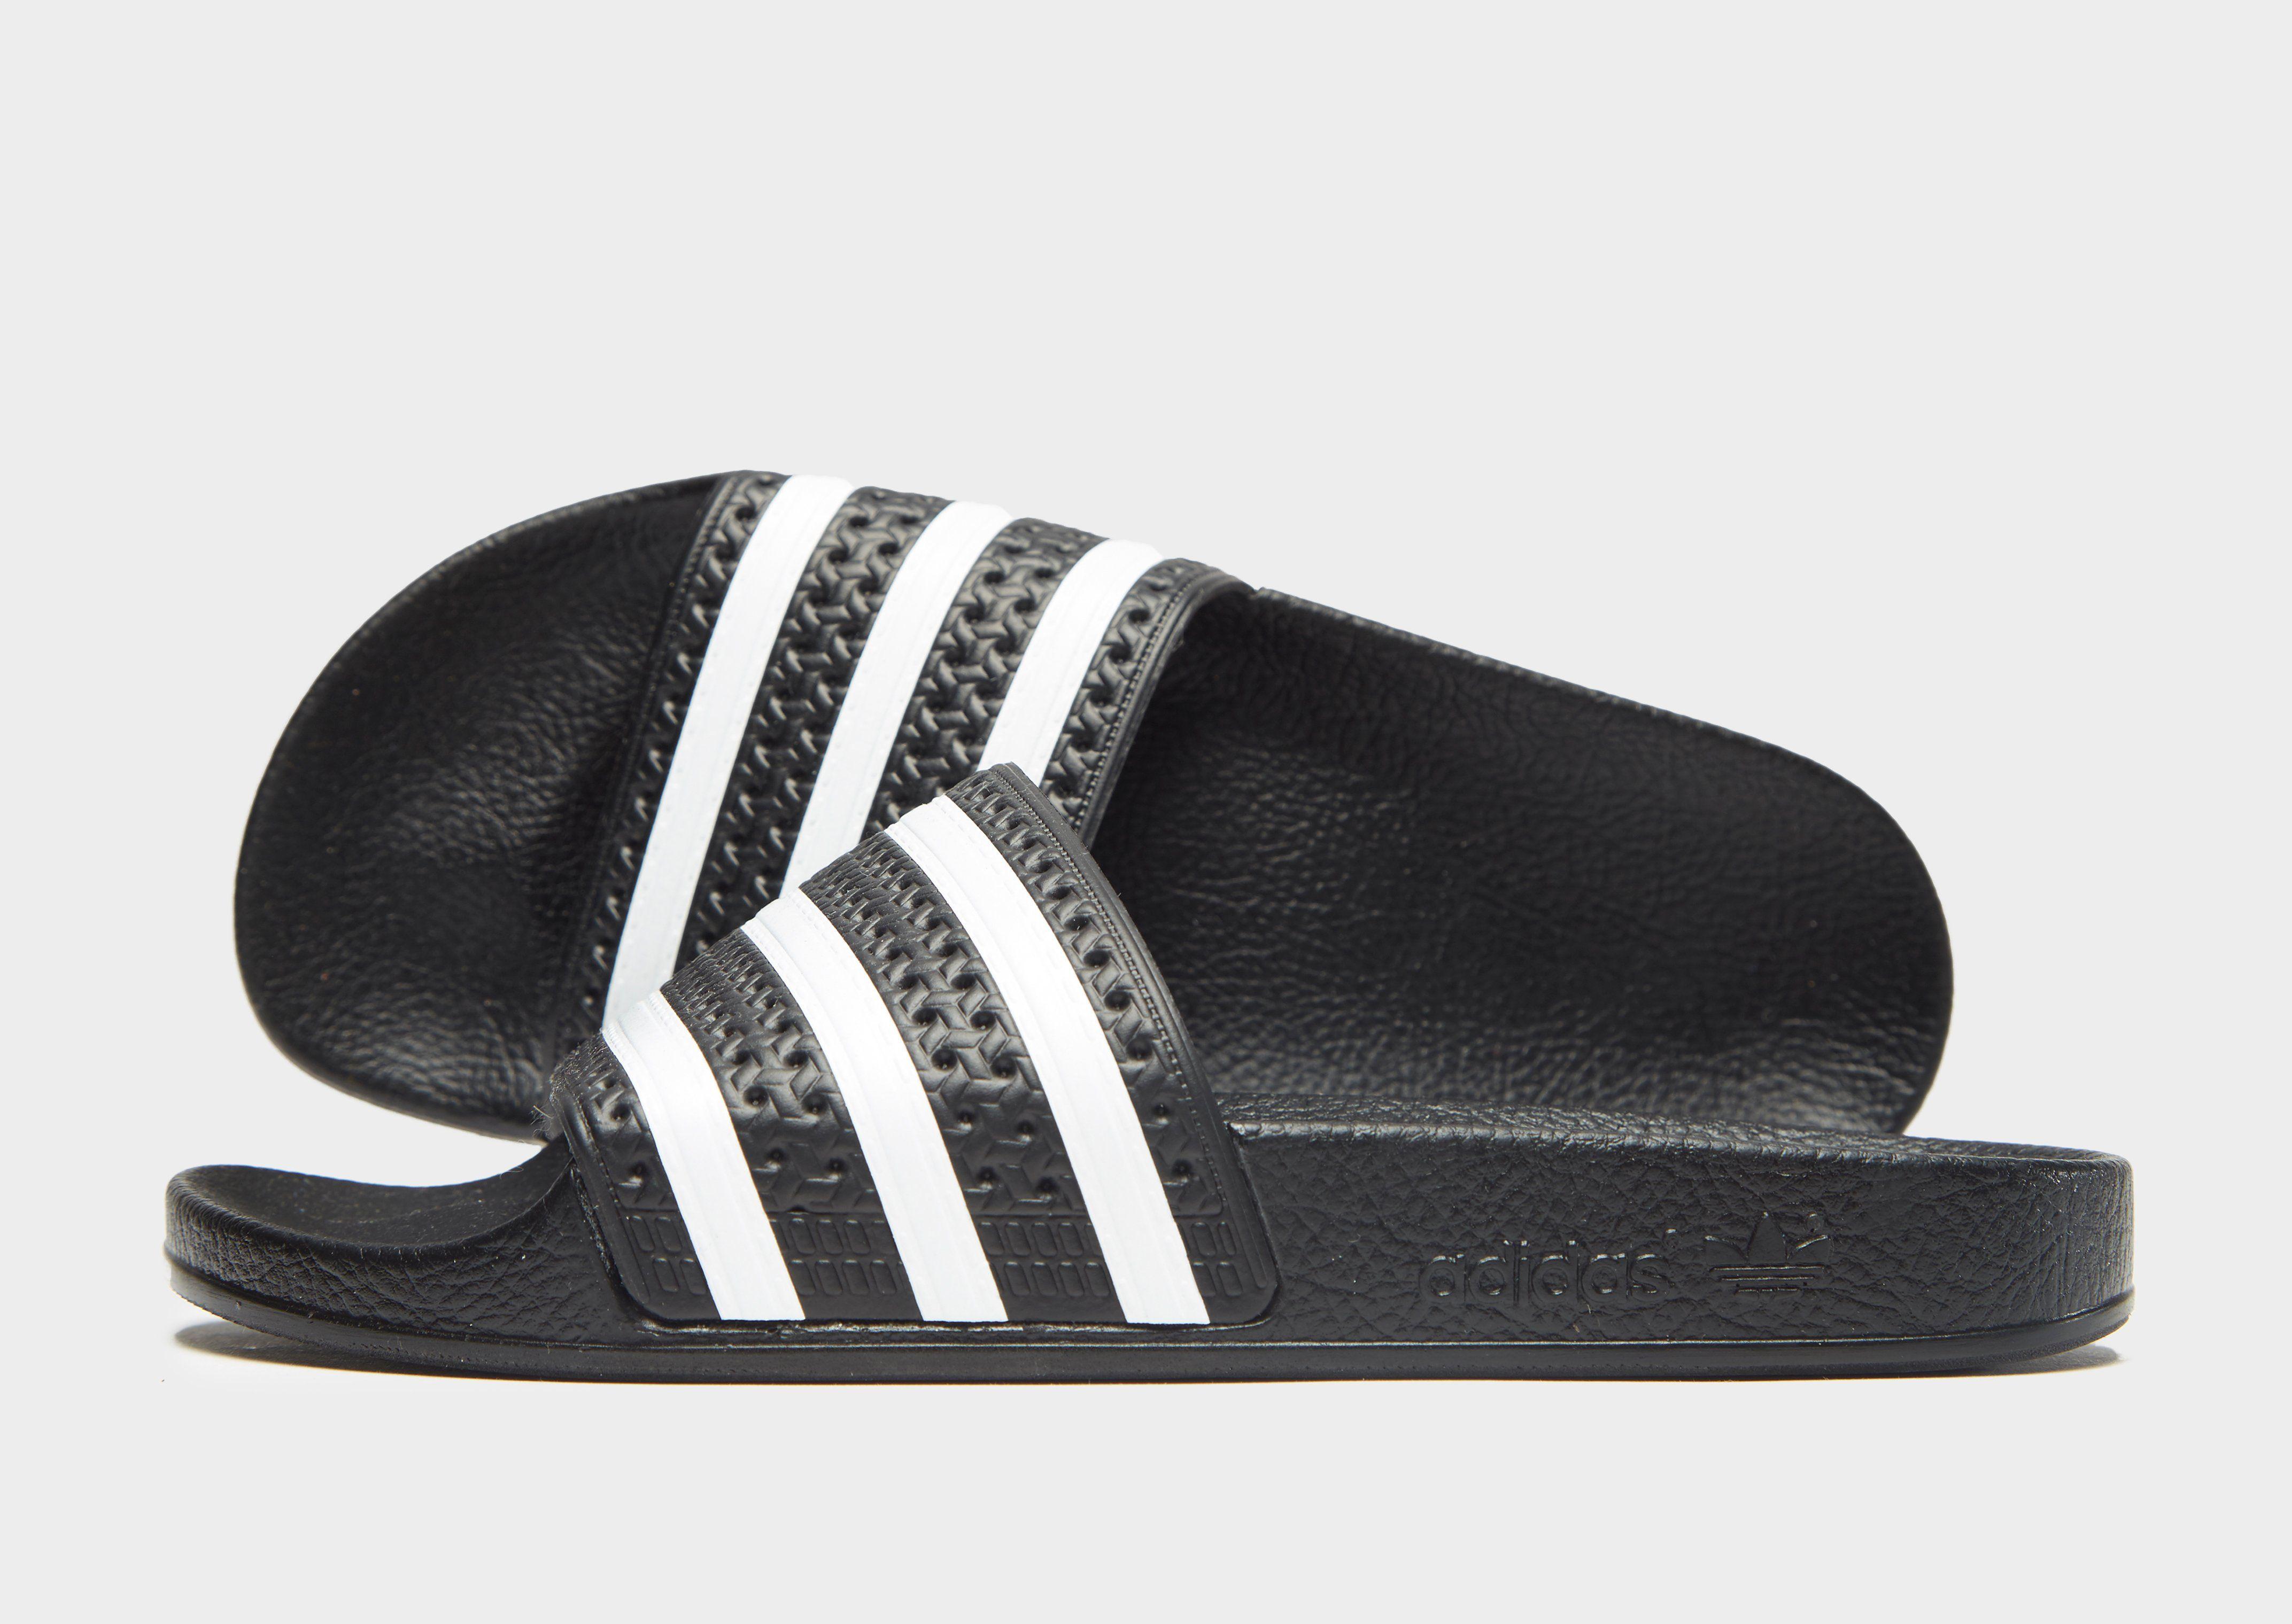 48e749630cc6 adidas Originals Adilette Slides Women s